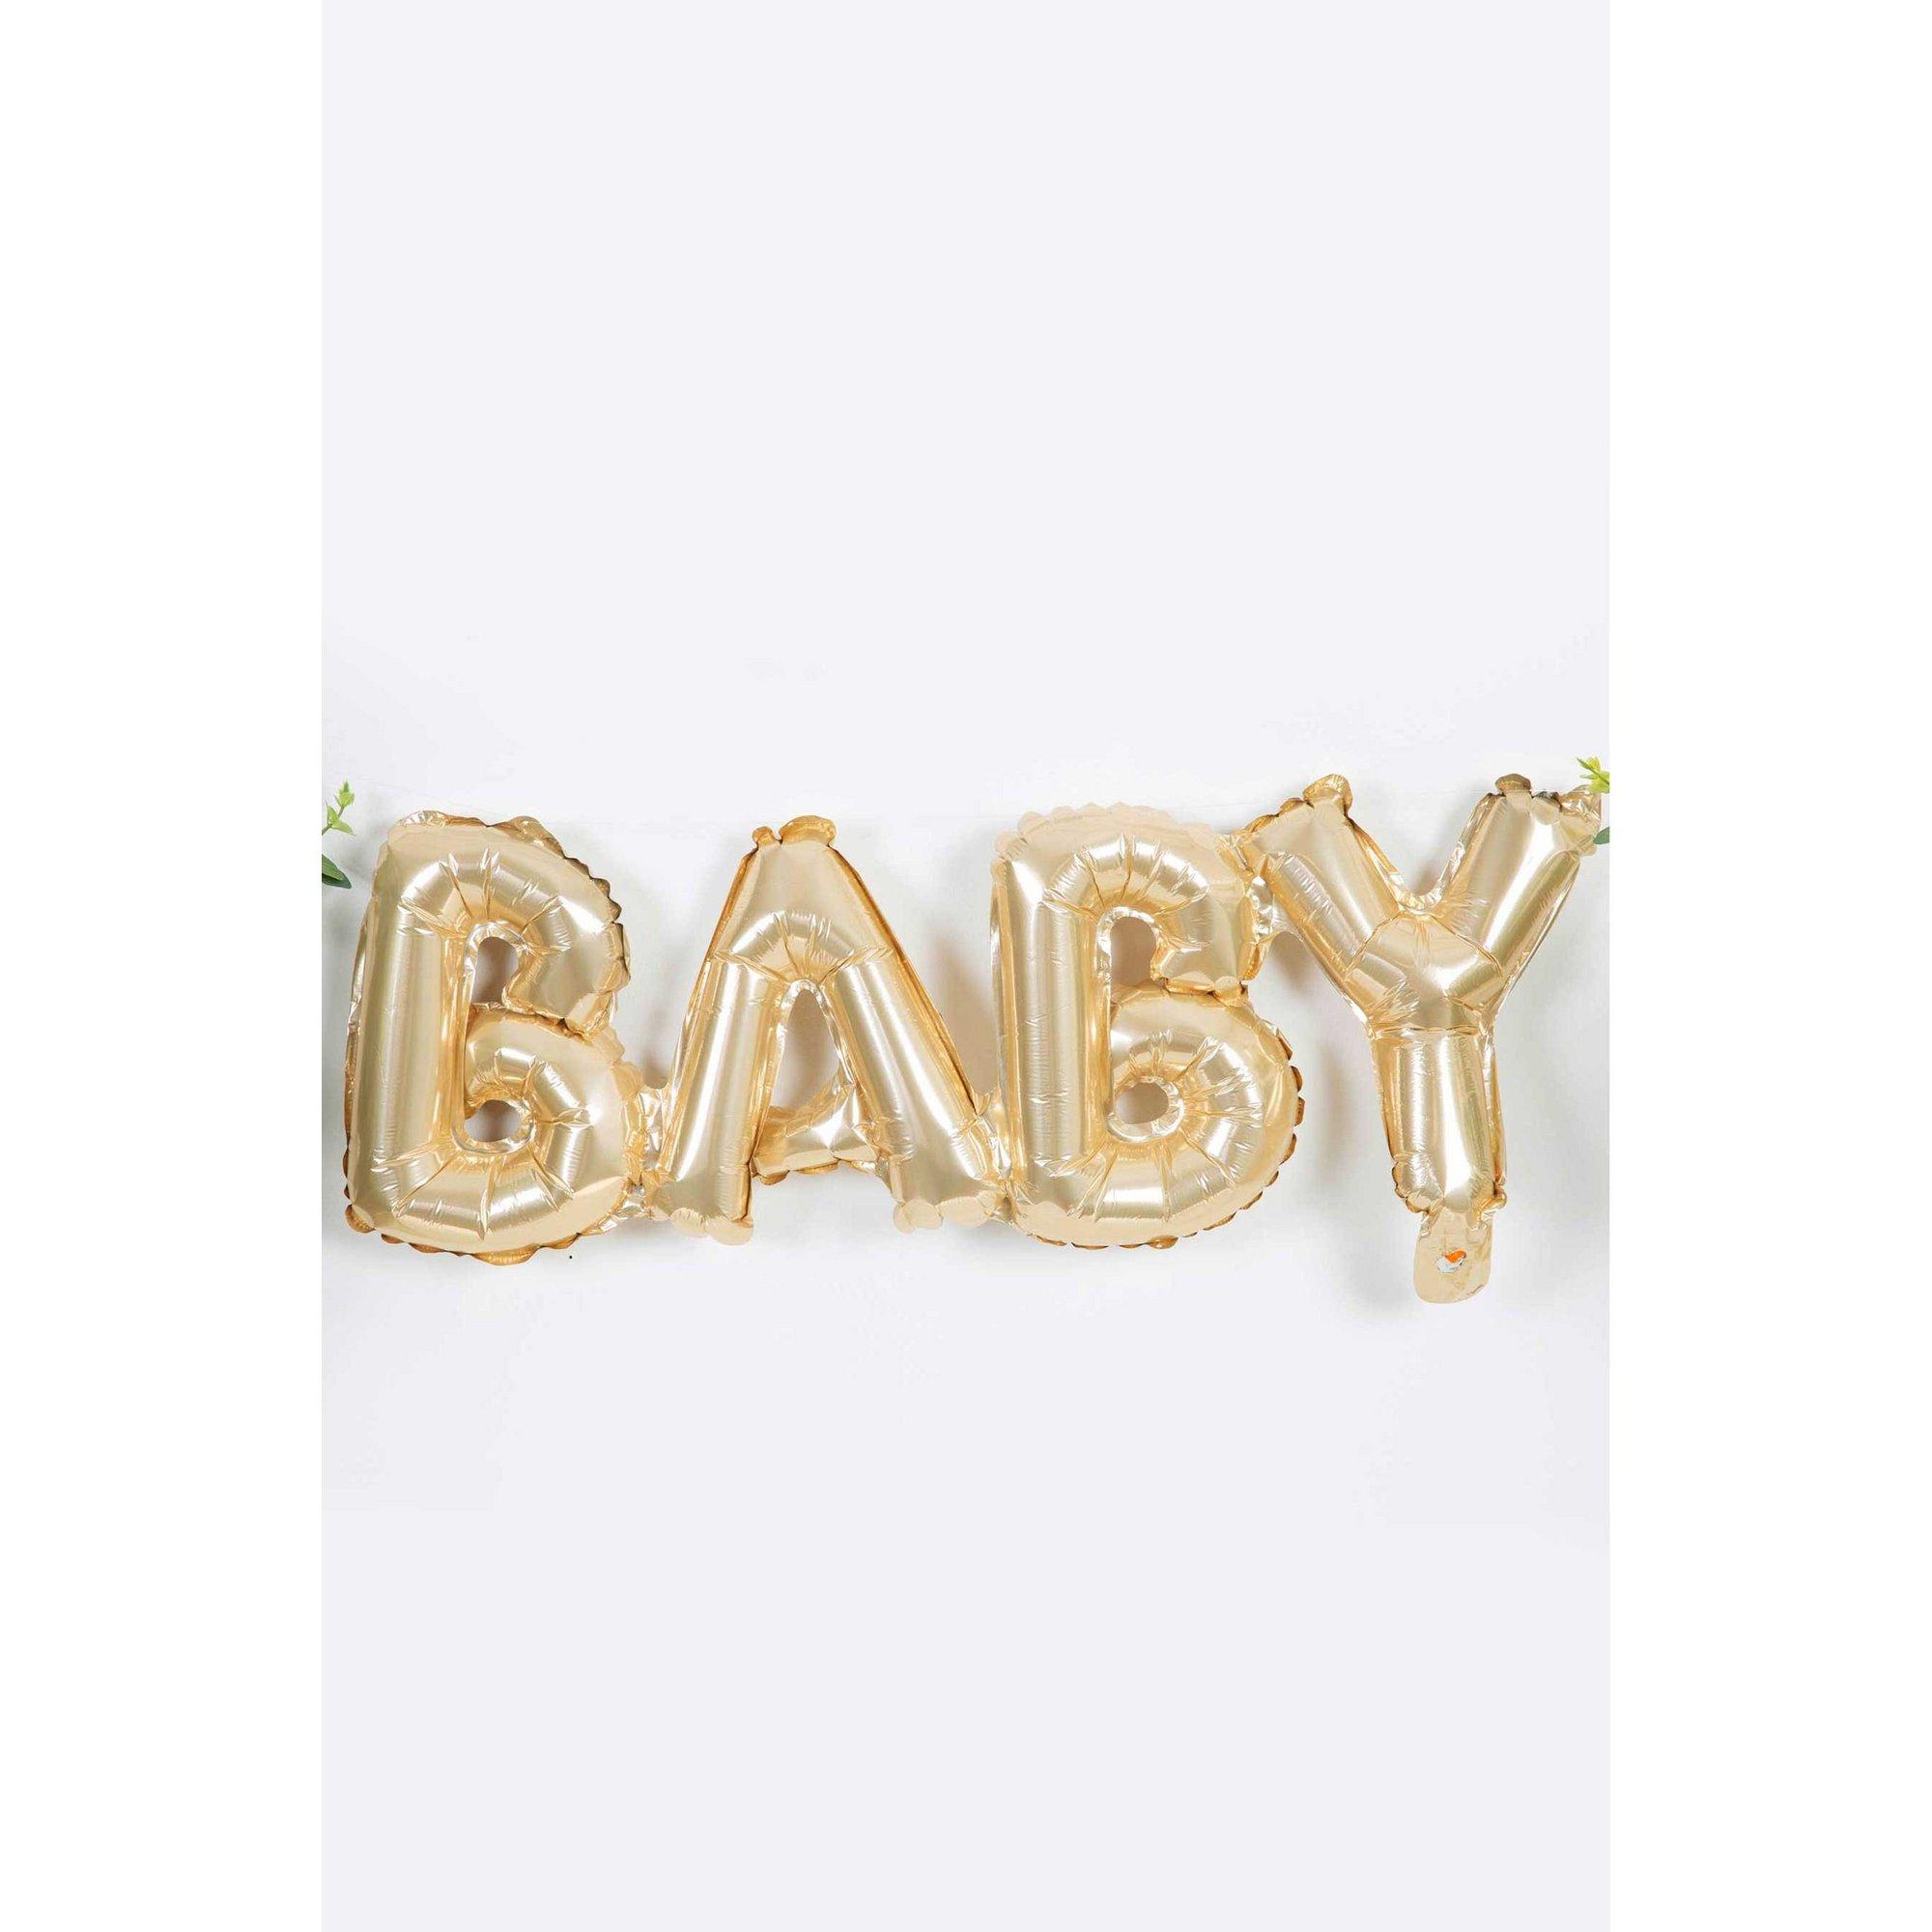 Image of Bambino Baby Shower Gold Balloon - Baby